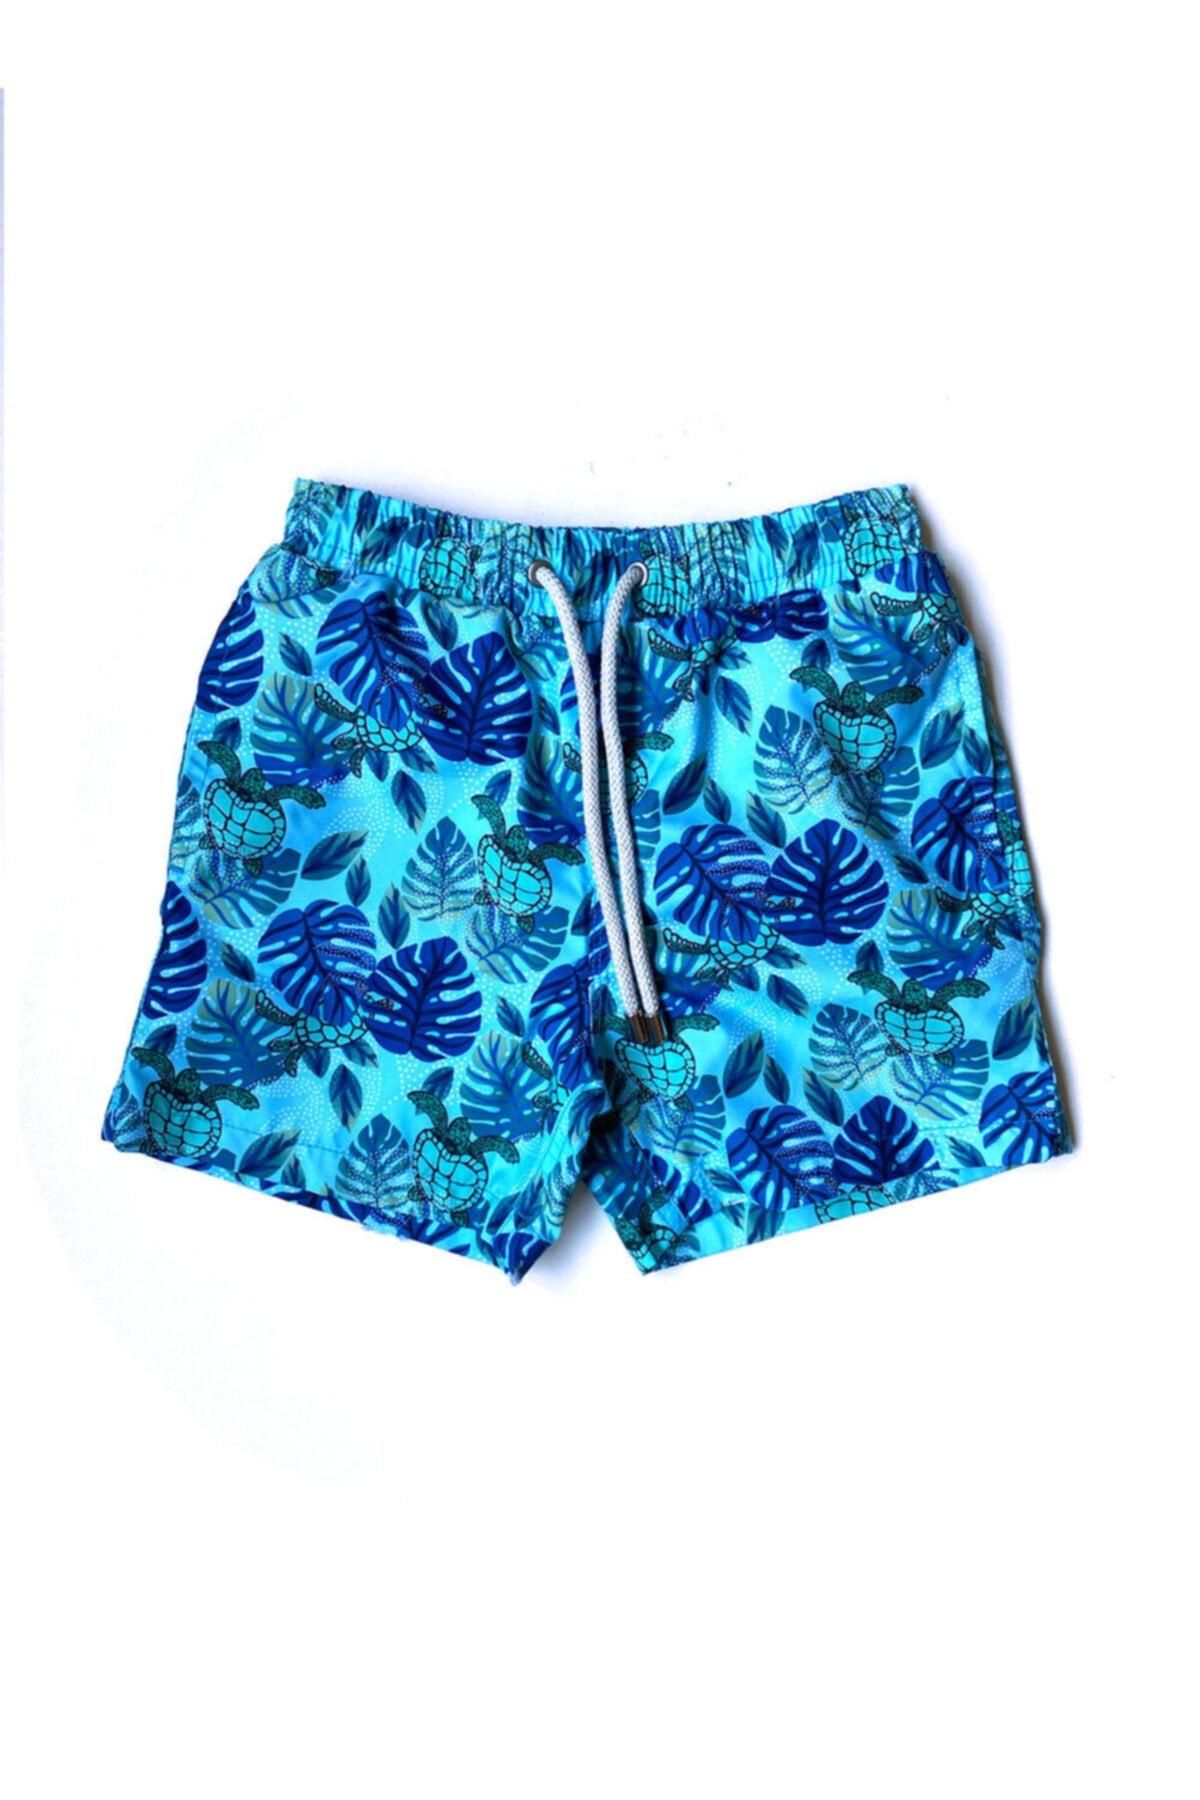 Blue Palm Erkek Çocuk Mayo Şort - Mıx